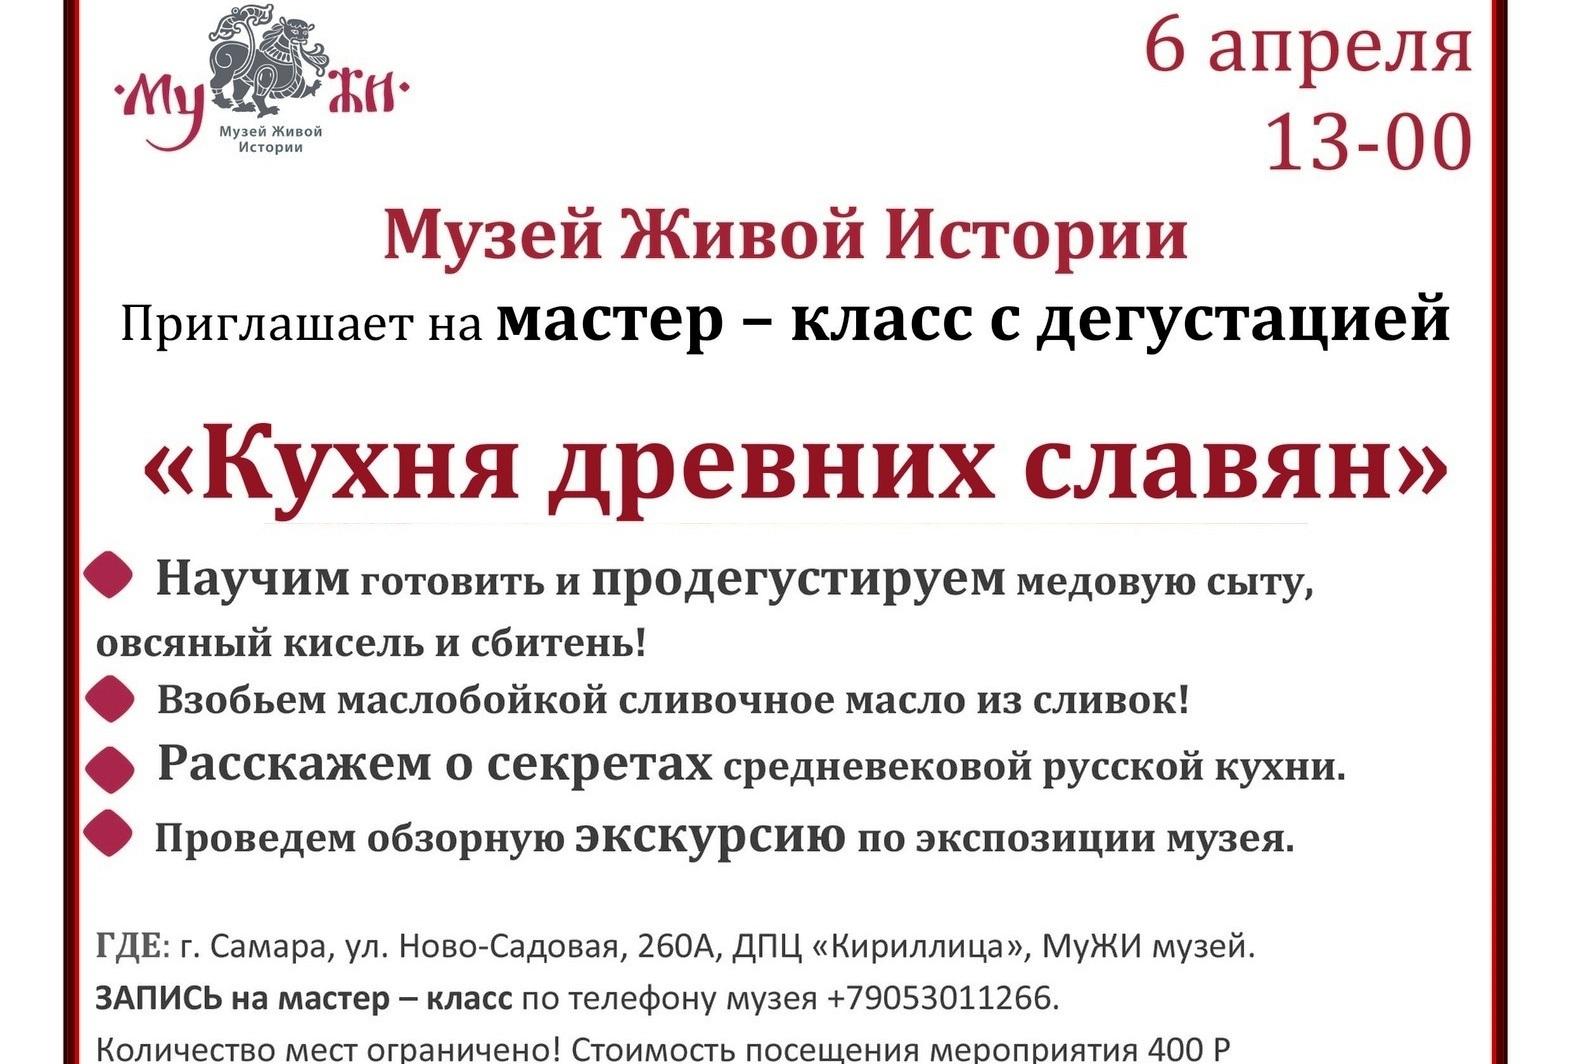 Кухня древних славян